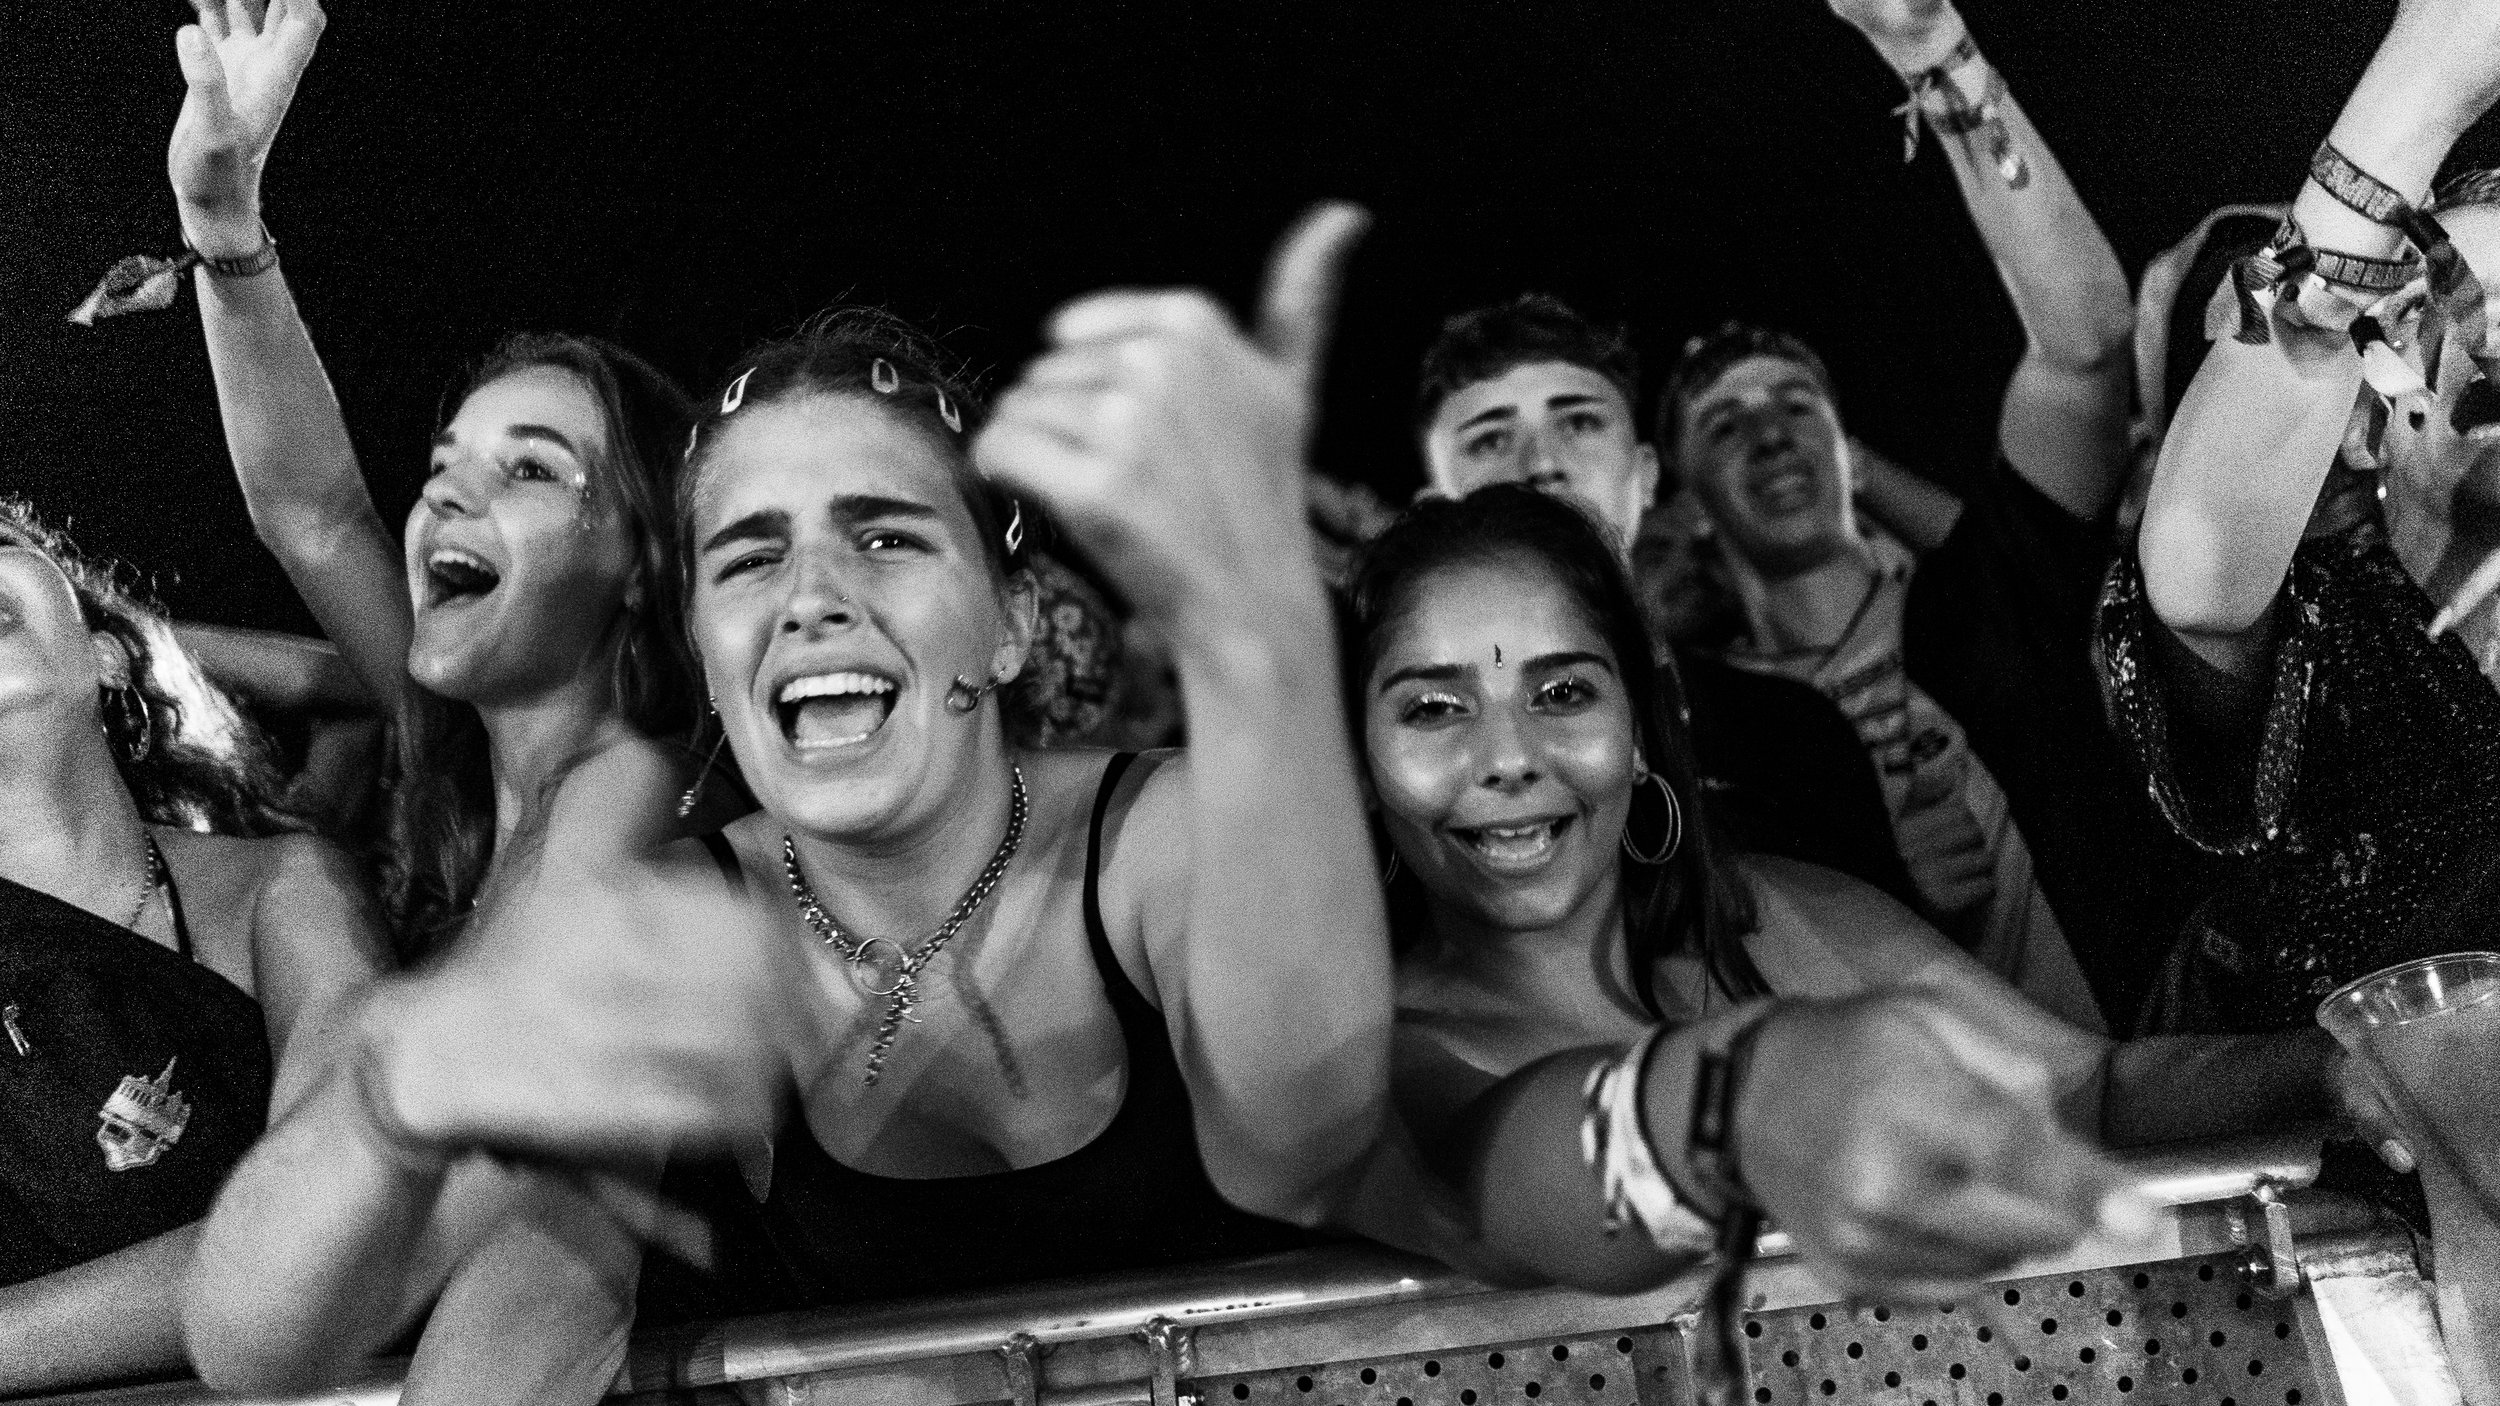 Outlook Festival 2018 by Callum Chaplin